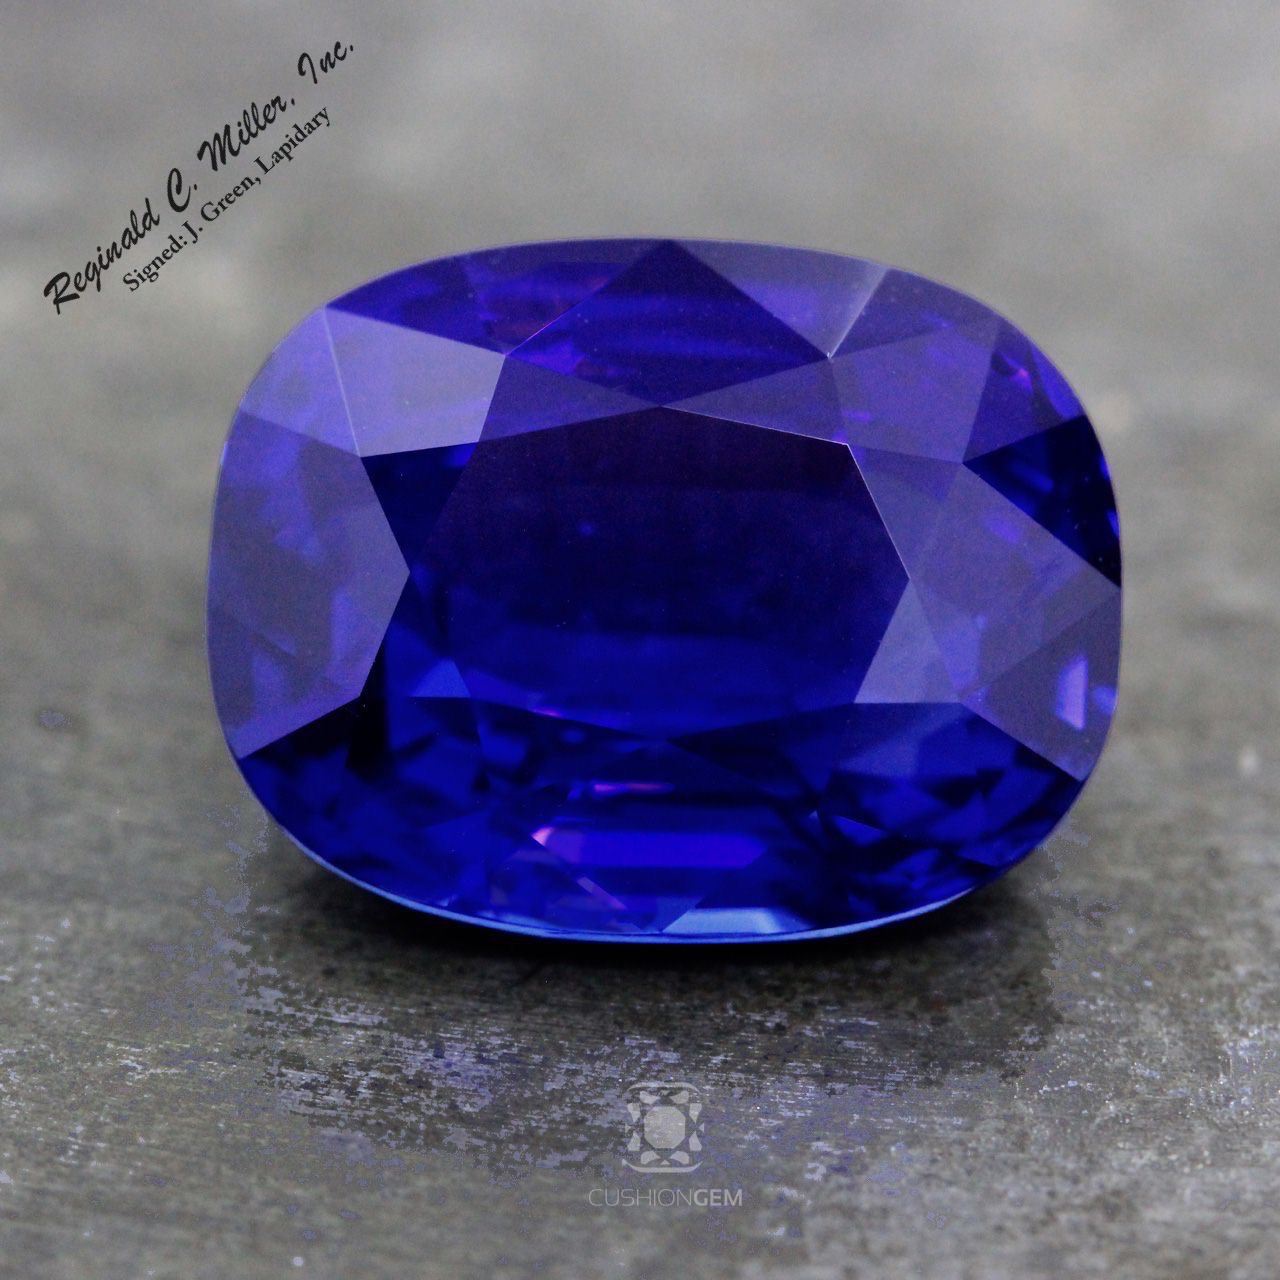 0111.59elaharasapphire.jpg